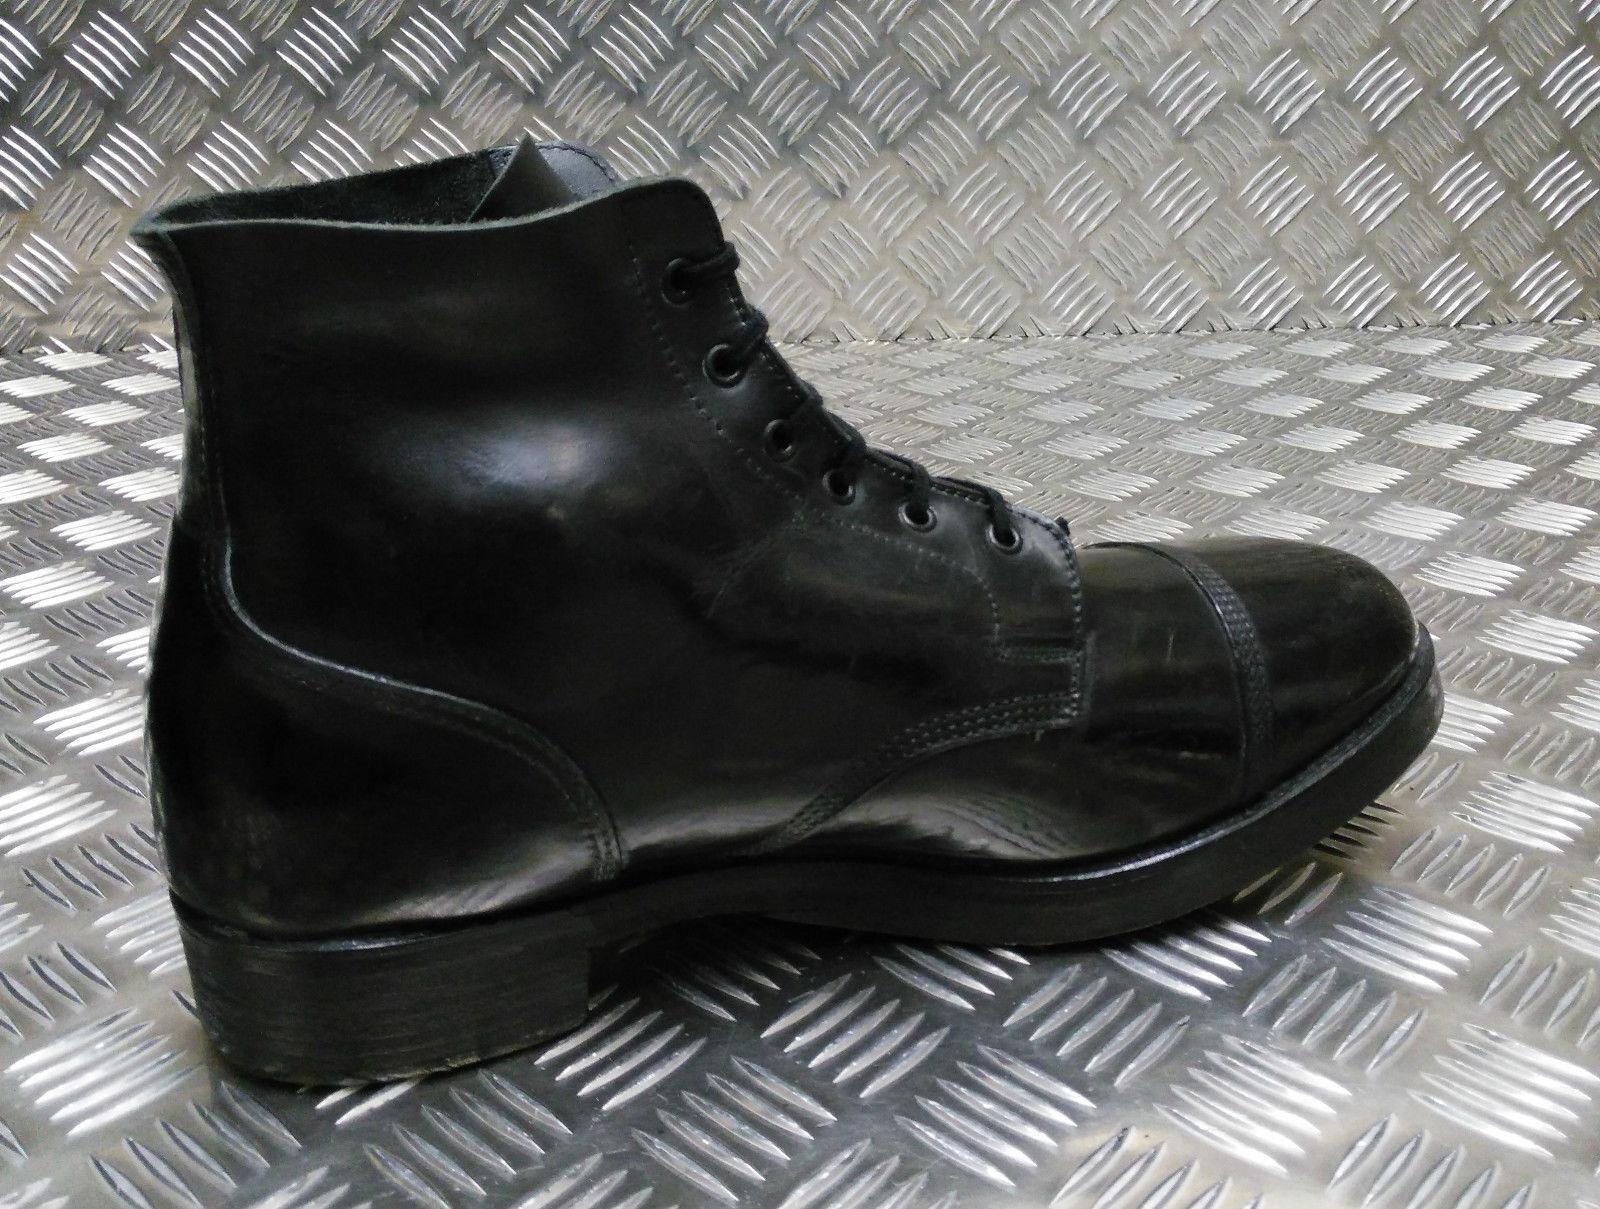 Genuine British Military Issue Stiefel Leder Ammo Parade Dress Stiefel Issue - All Größes ff0385